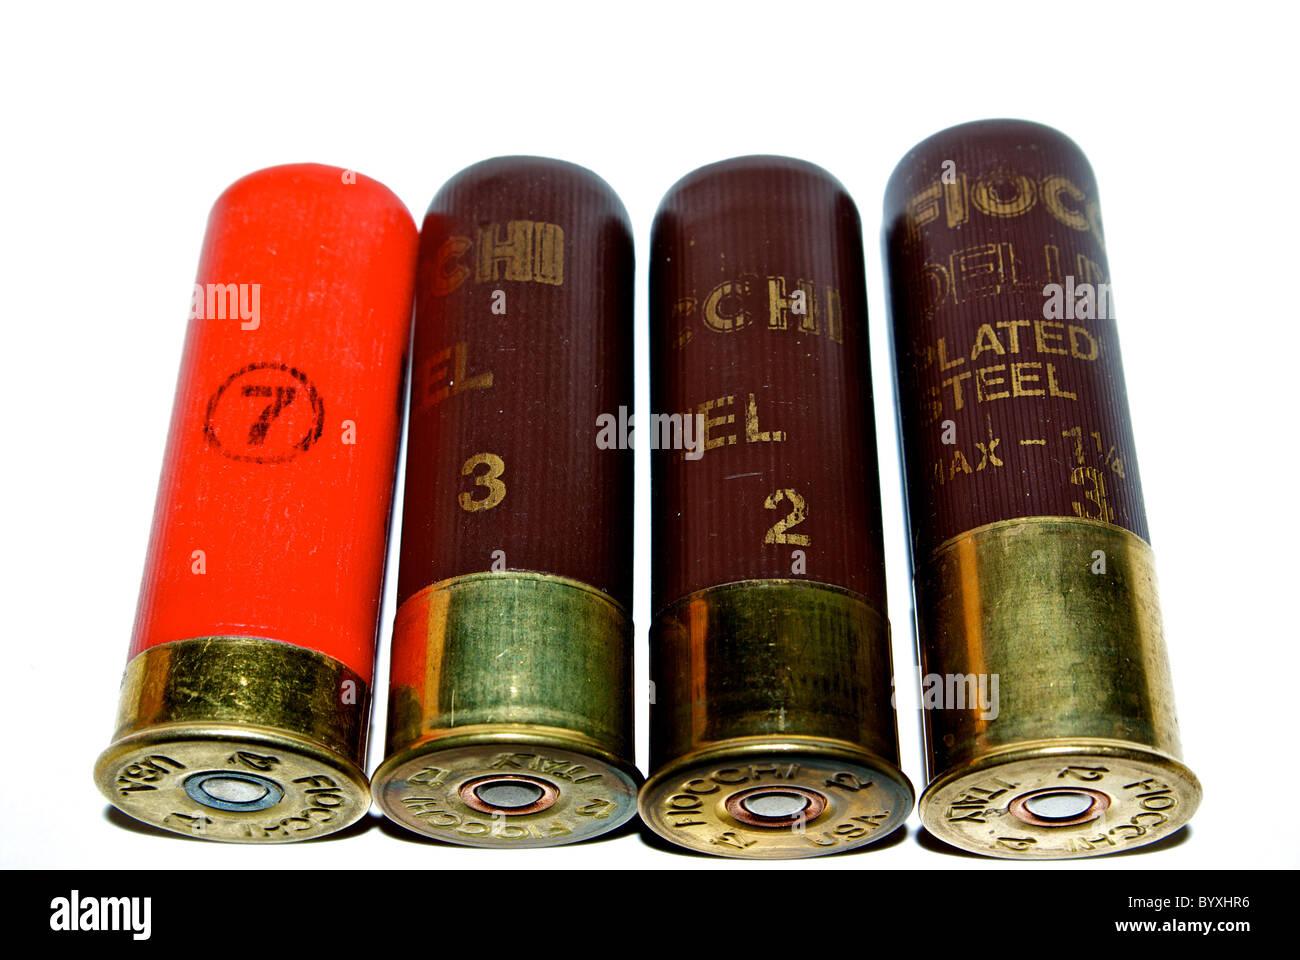 12 gauge shotgun shells migratory duck hunting ammunition ...